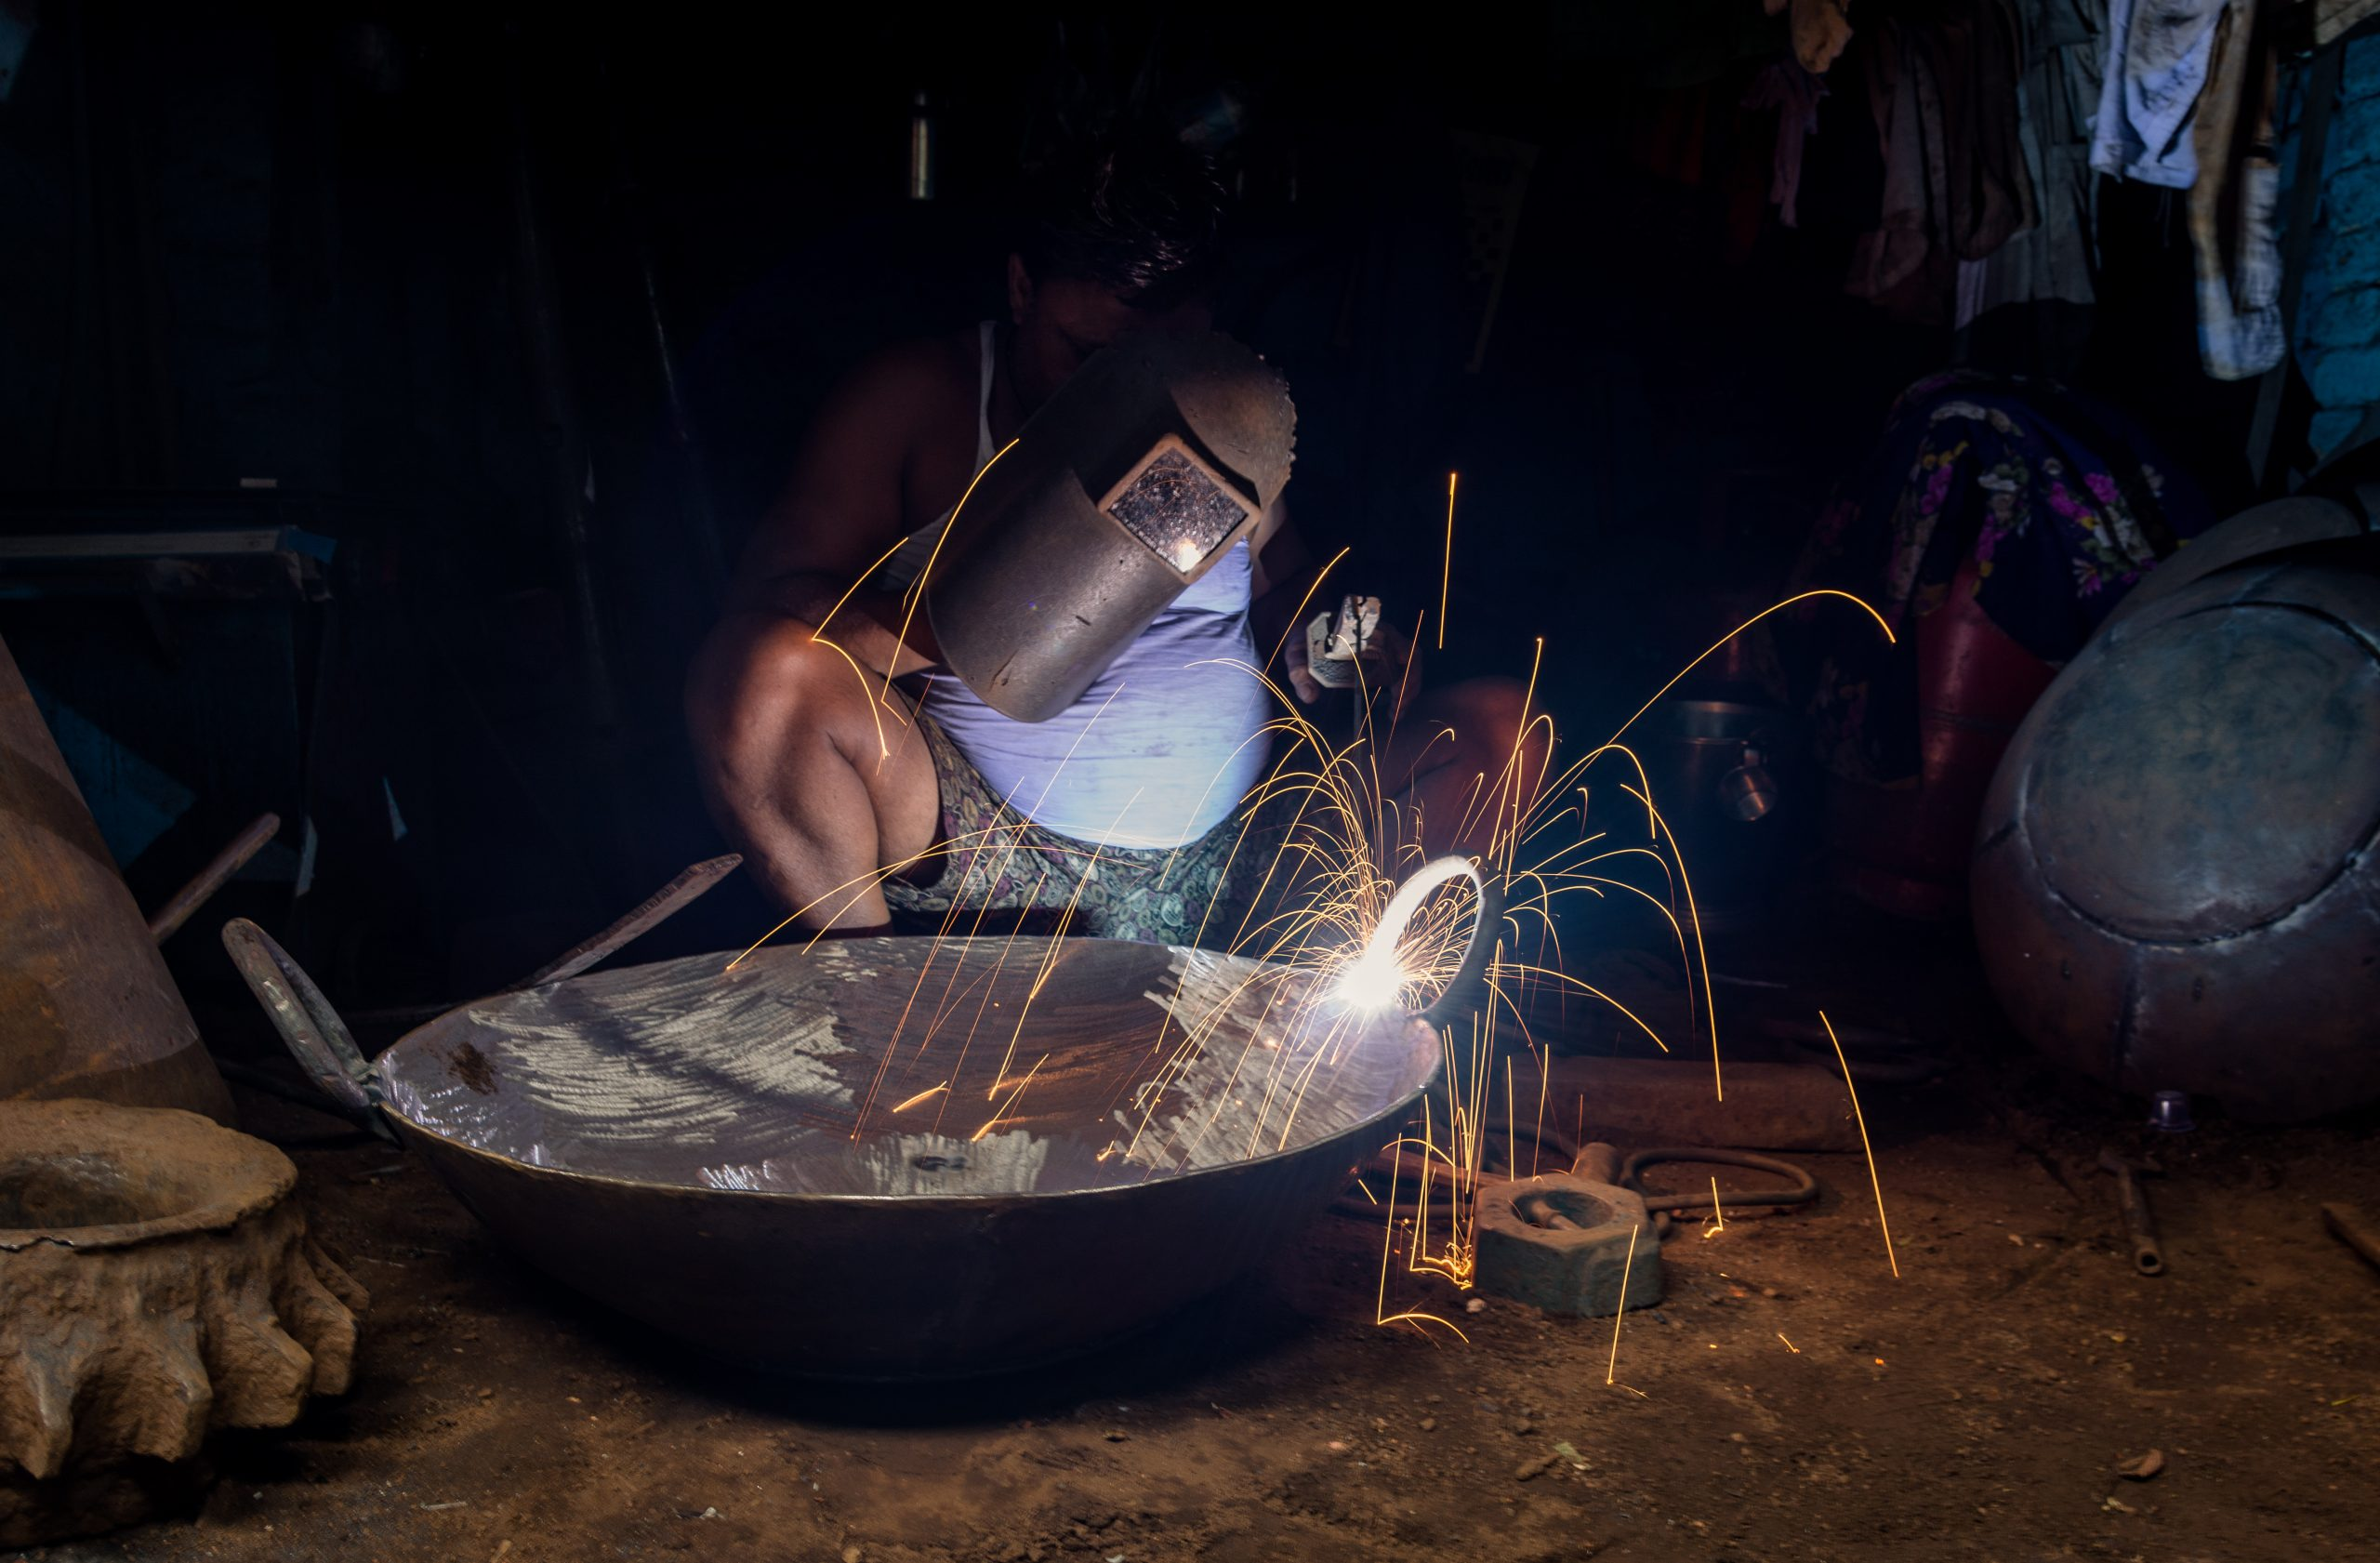 Welding work on a Cauldron